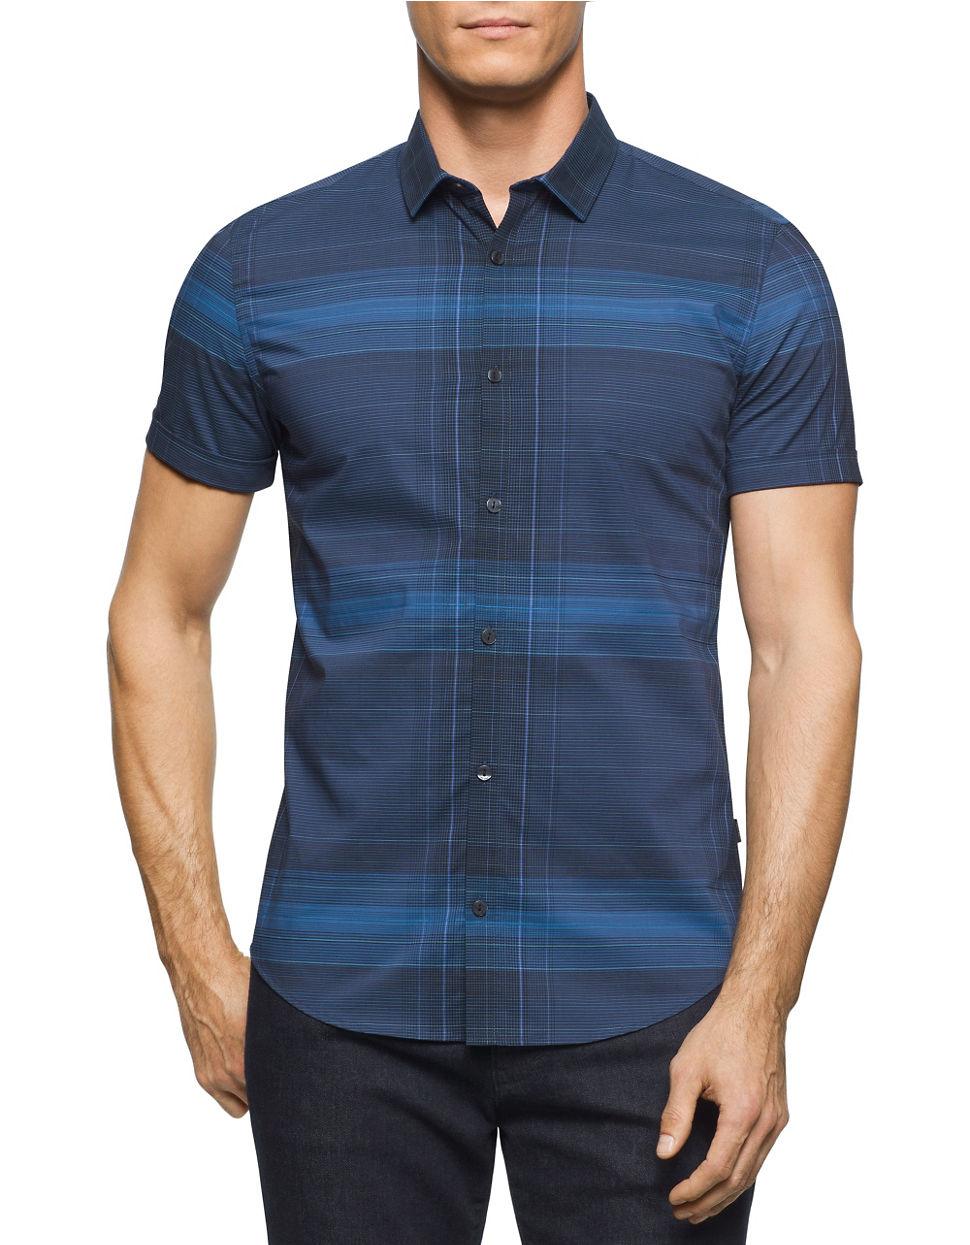 Calvin klein block striped button down shirt in blue for for Striped button down shirts for men